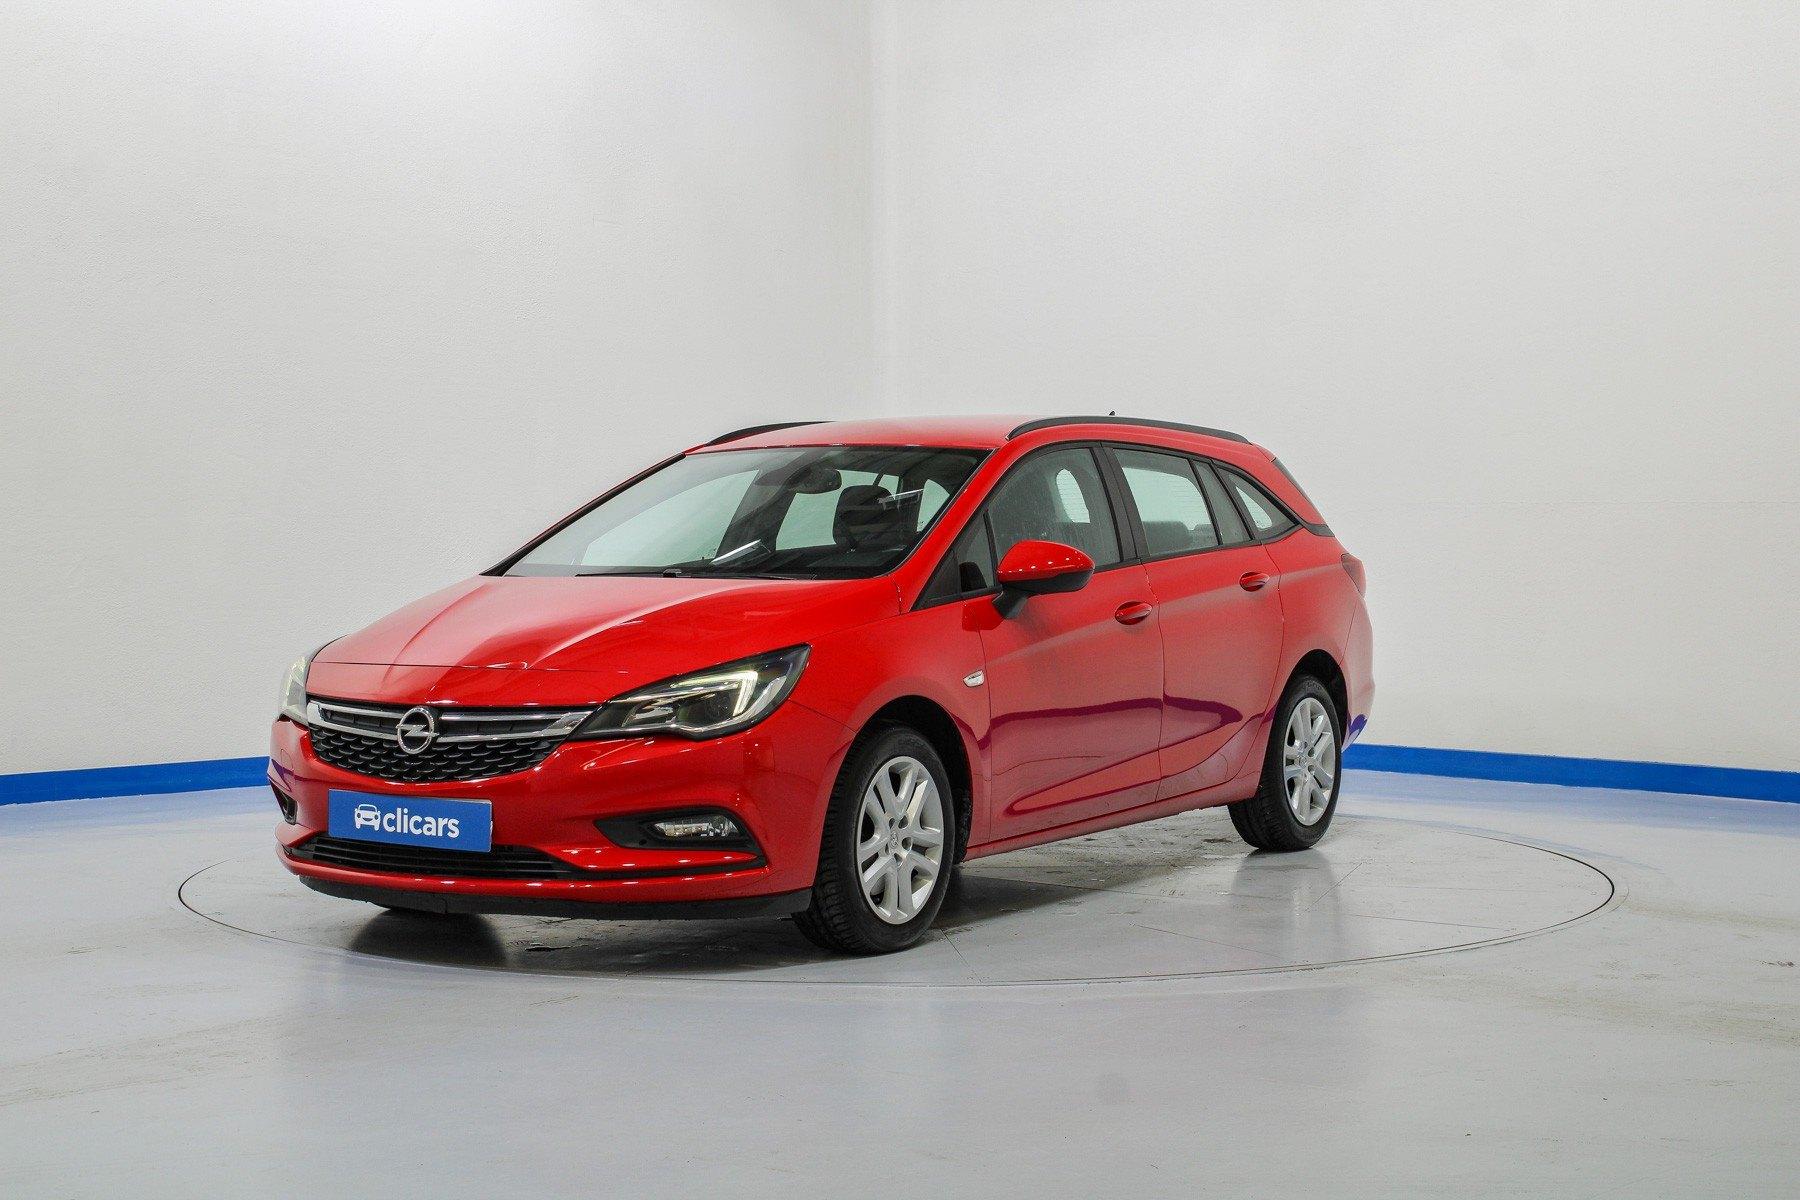 Opel Astra Diésel 1.6 CDTi 110 CV Selective ST 1